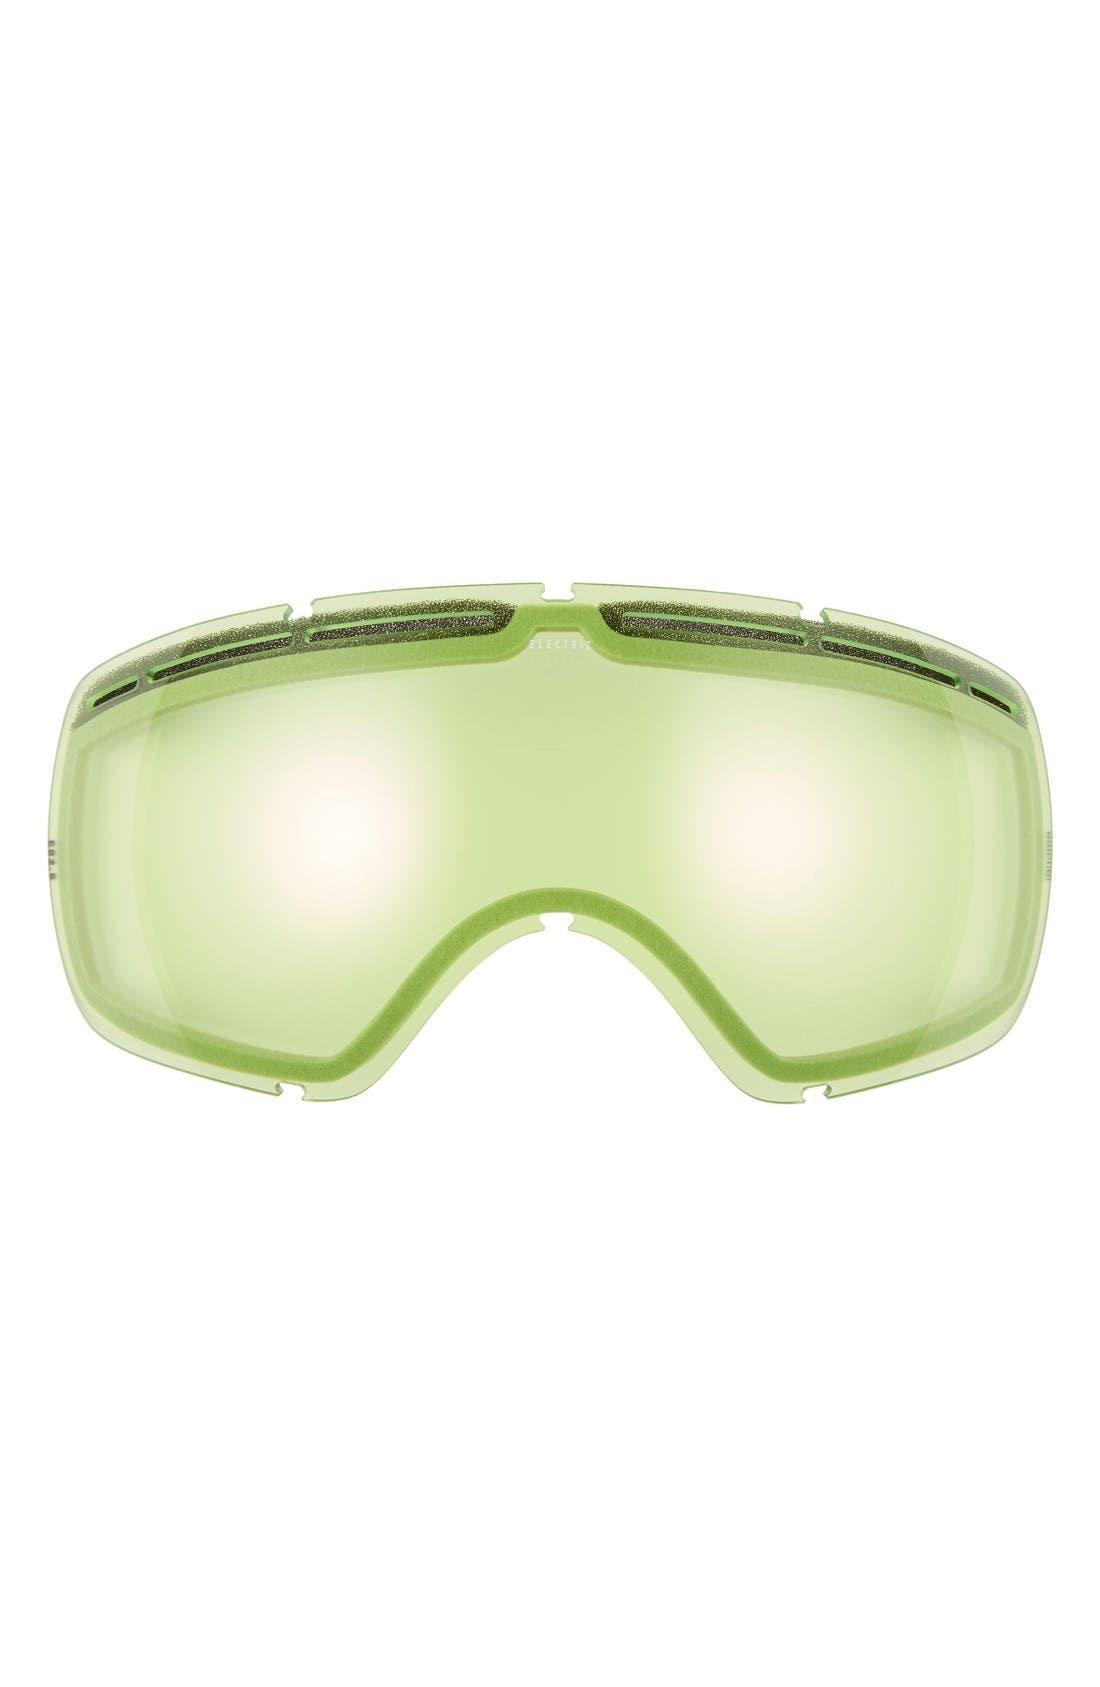 Alternate Image 3  - ELECTRIC EG 2.5 215mm Snow Goggles